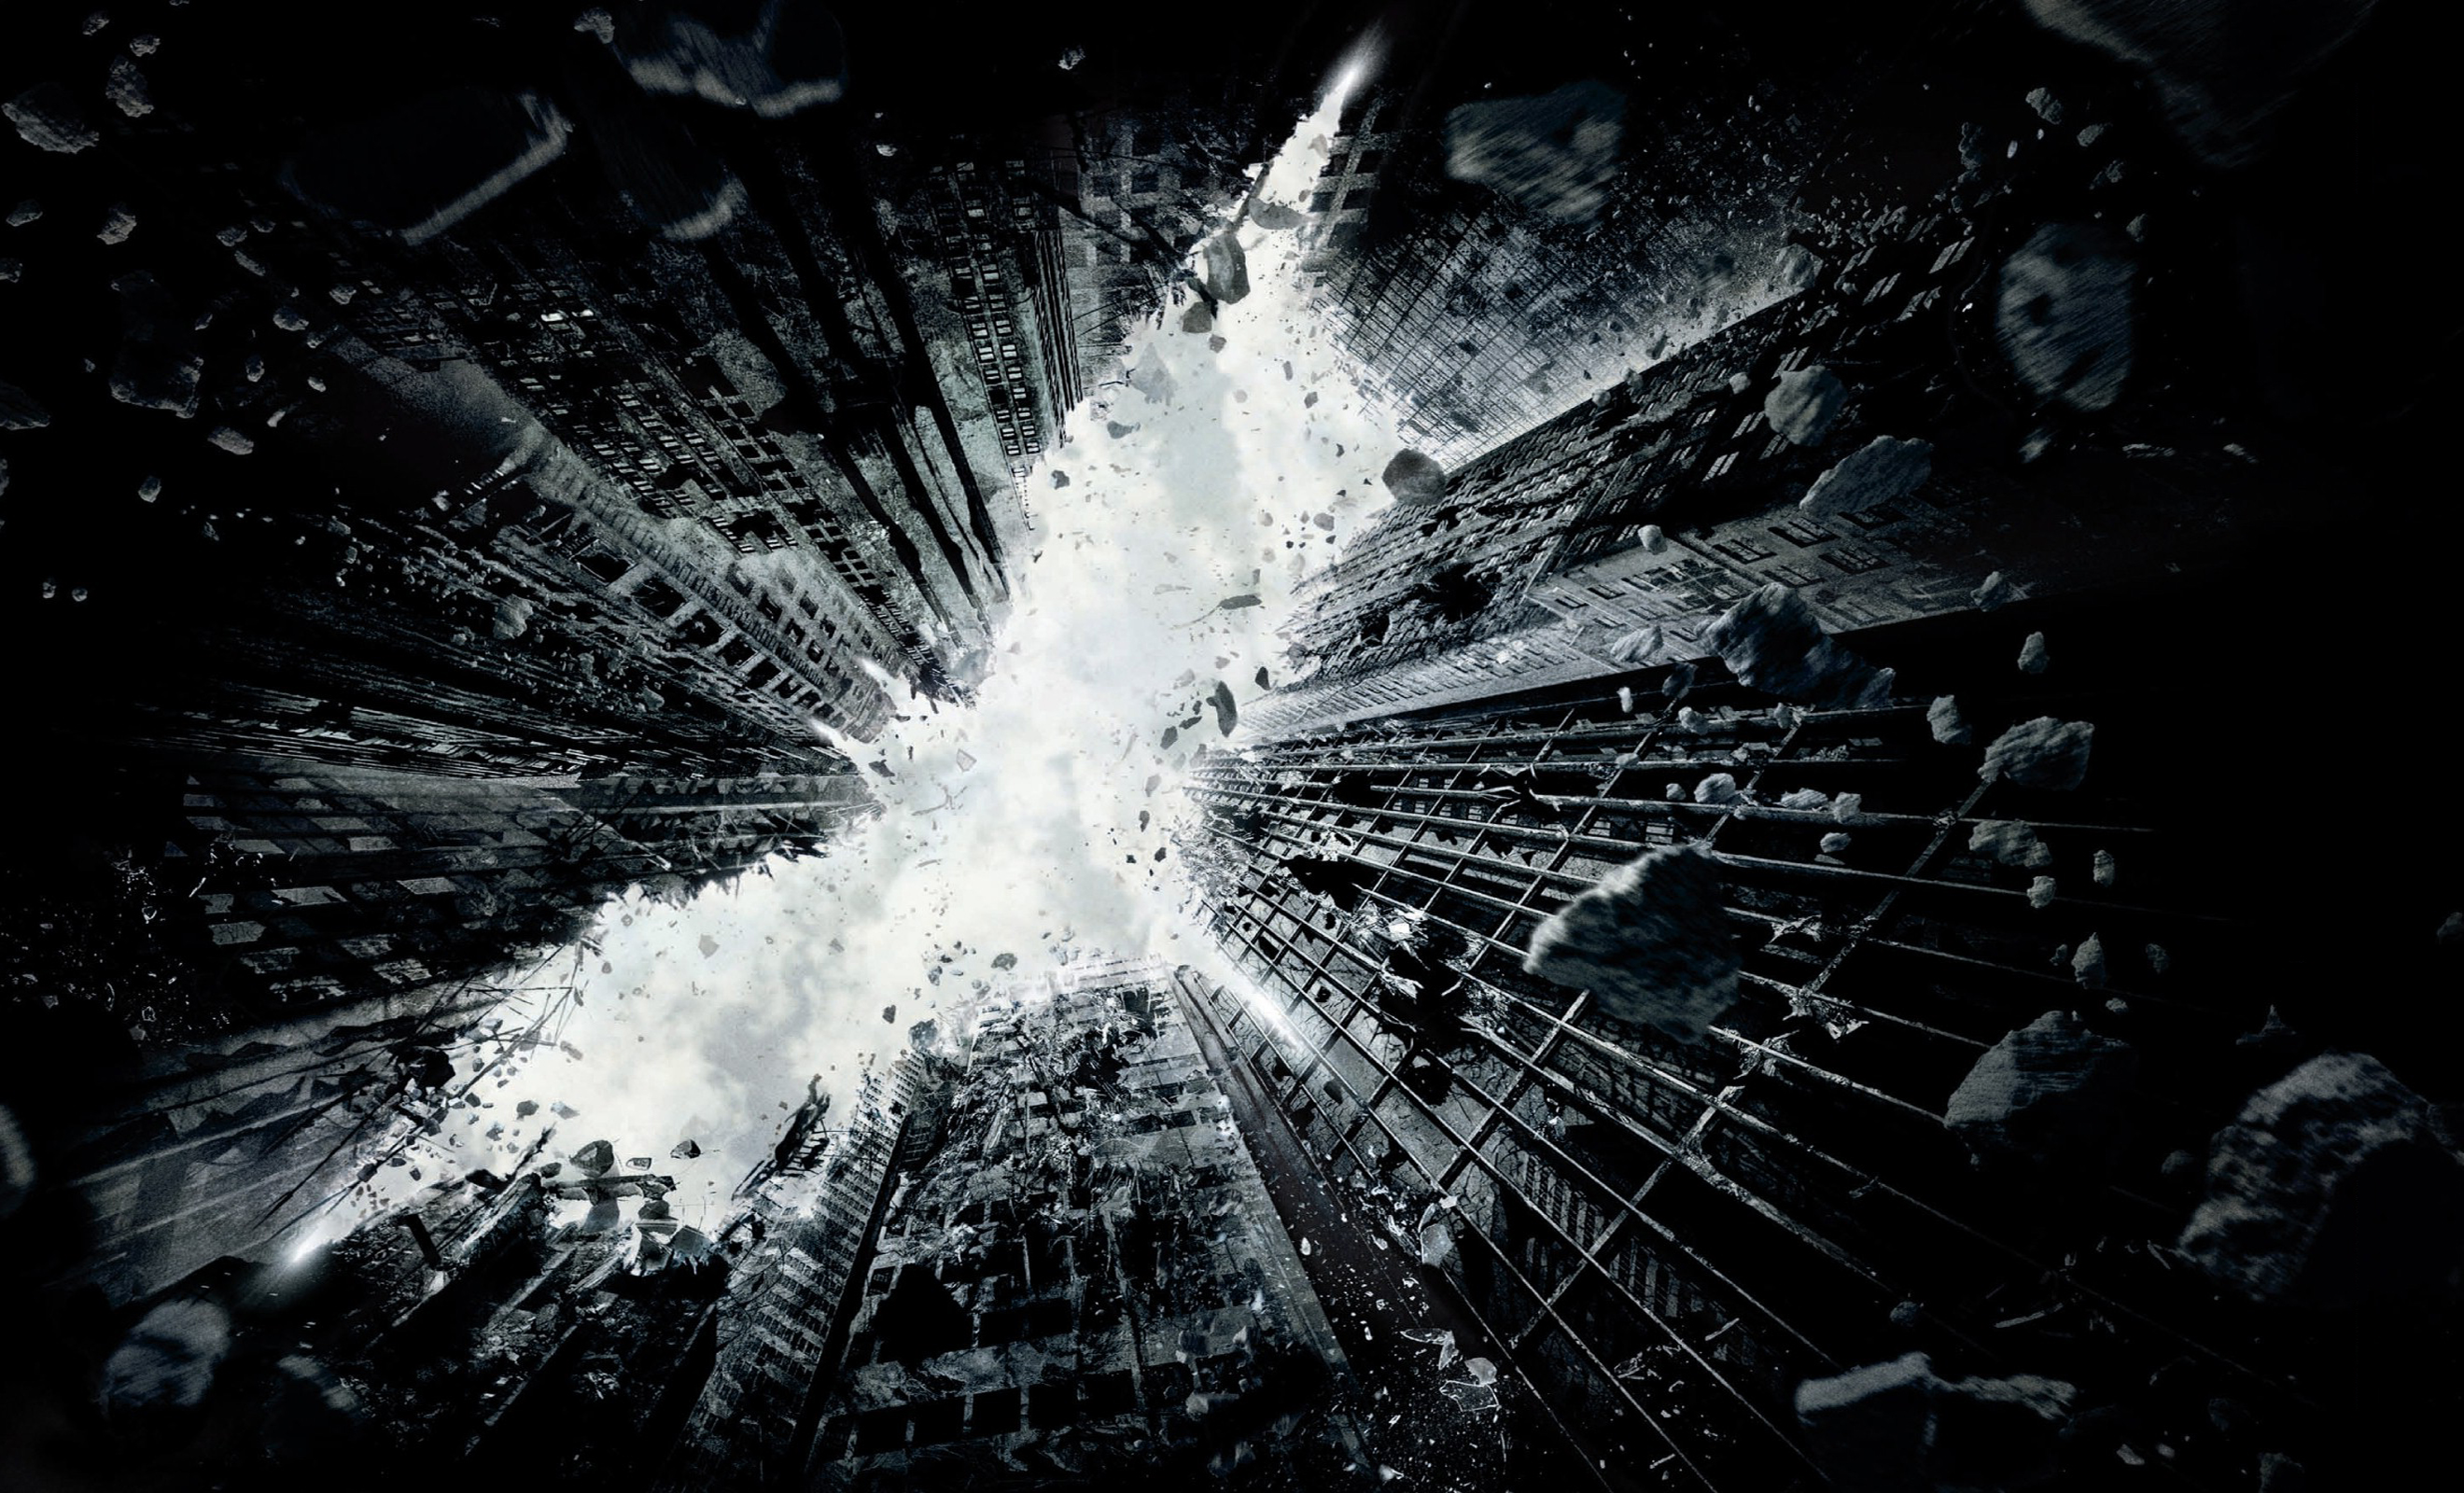 The Dark Knight Rises Logo Wallpaper wwwgalleryhipcom 2640x1600